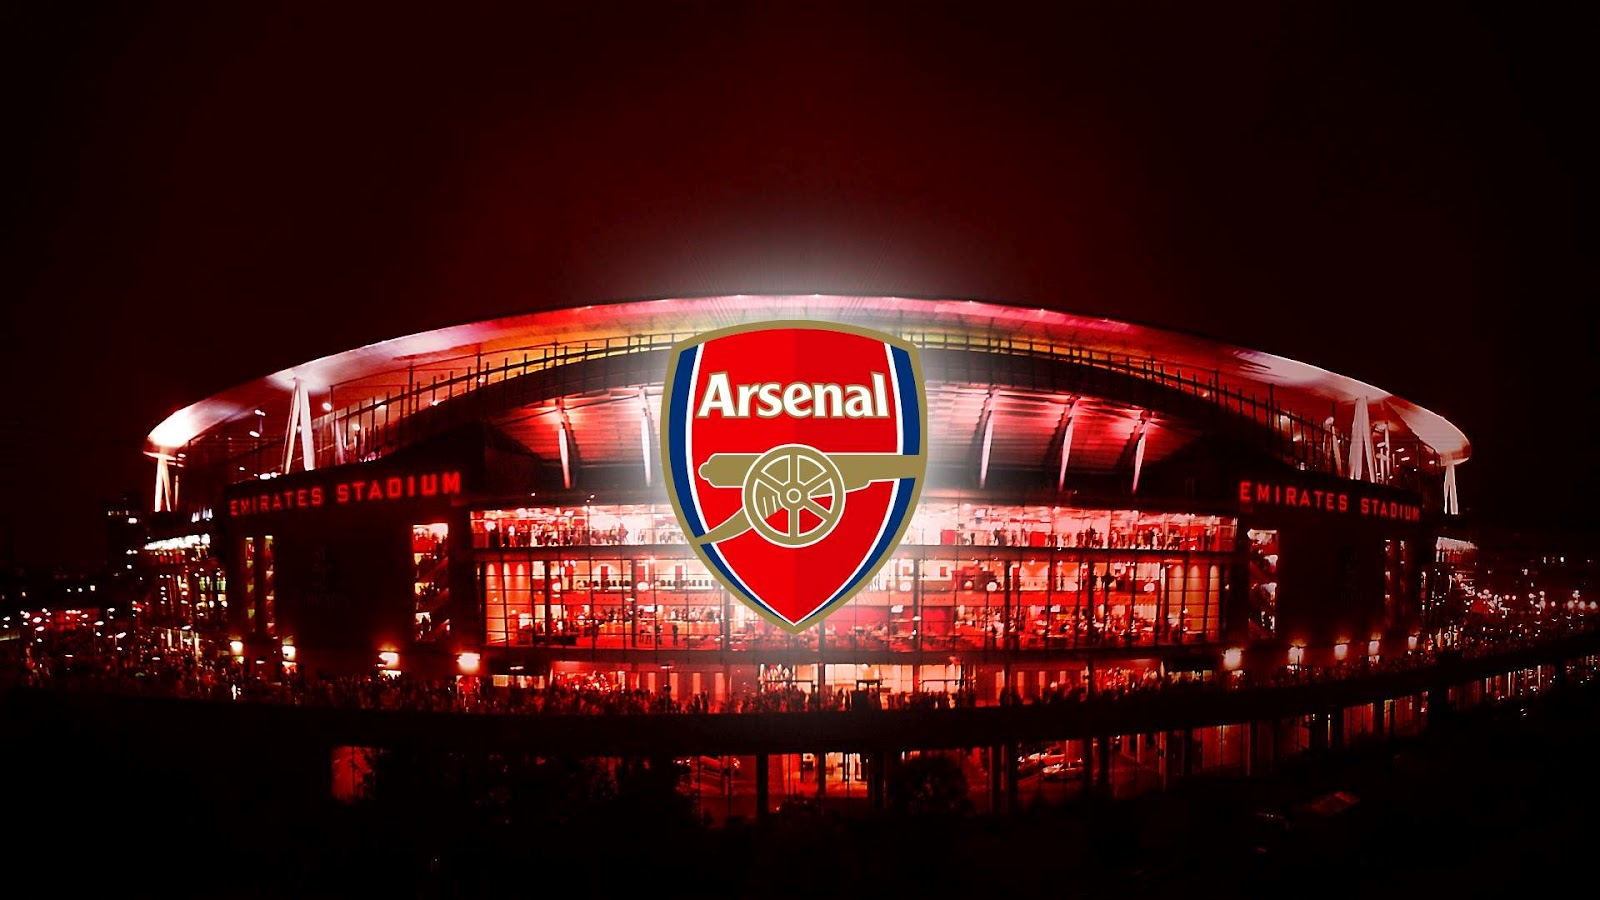 Beautiful Arsenal Logo And Emirates Stadium Image HD Wallpapers 2014 1600x900